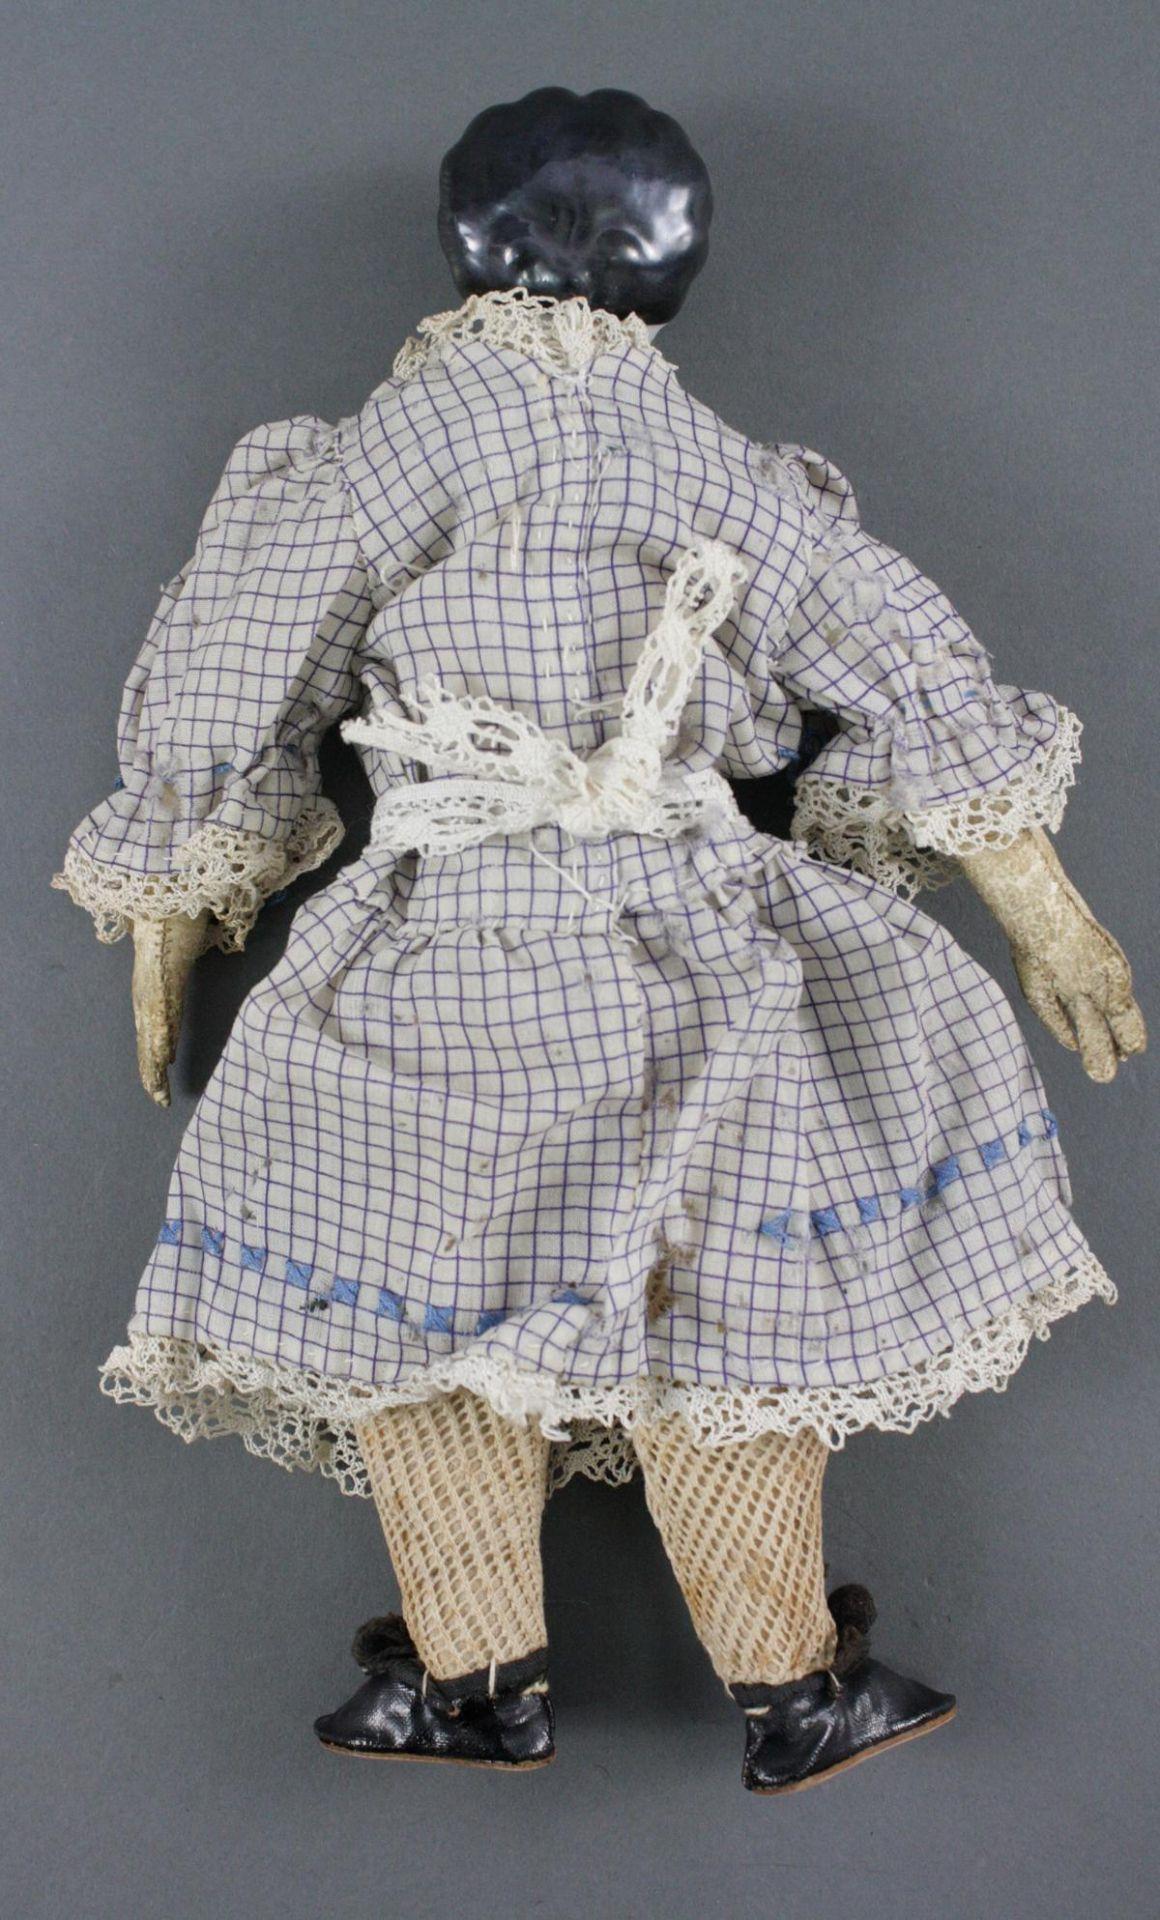 Biedermeier Puppe, 19. Jahrhundert - Bild 2 aus 3